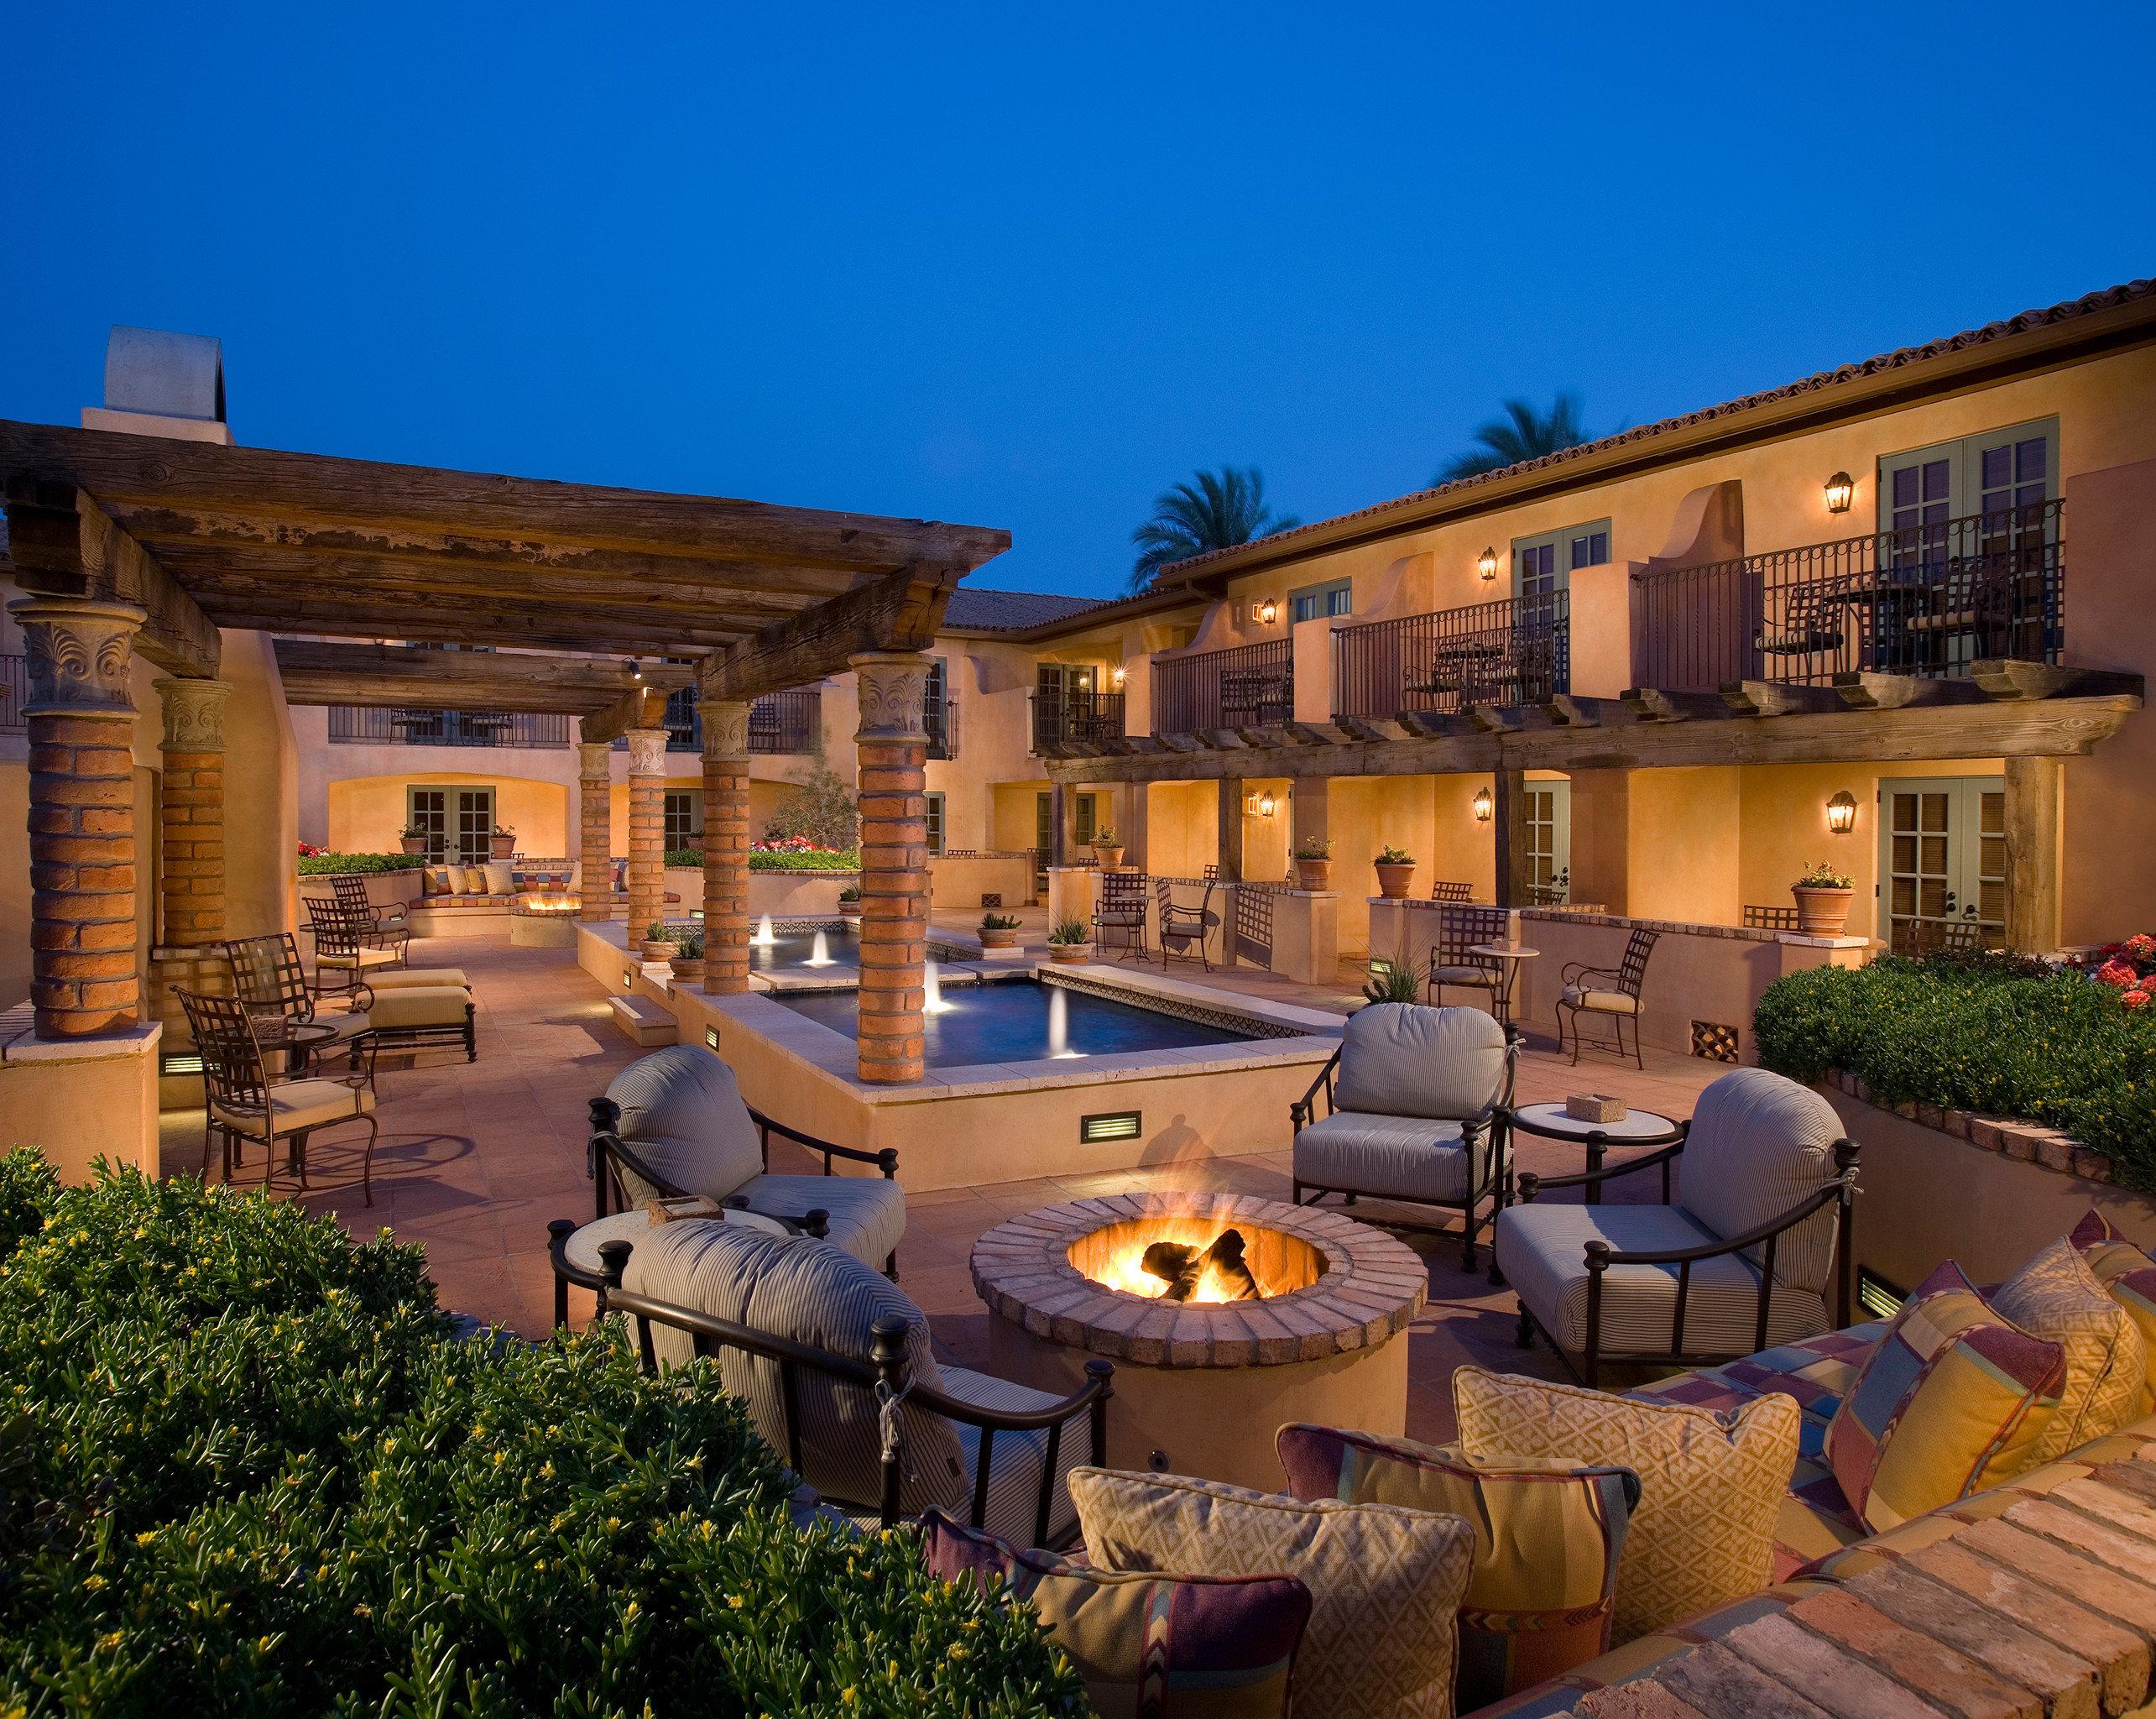 Balcony Fireplace Pool Resort Terrace sky property Town house condominium home residential area Villa Courtyard backyard mansion Village set